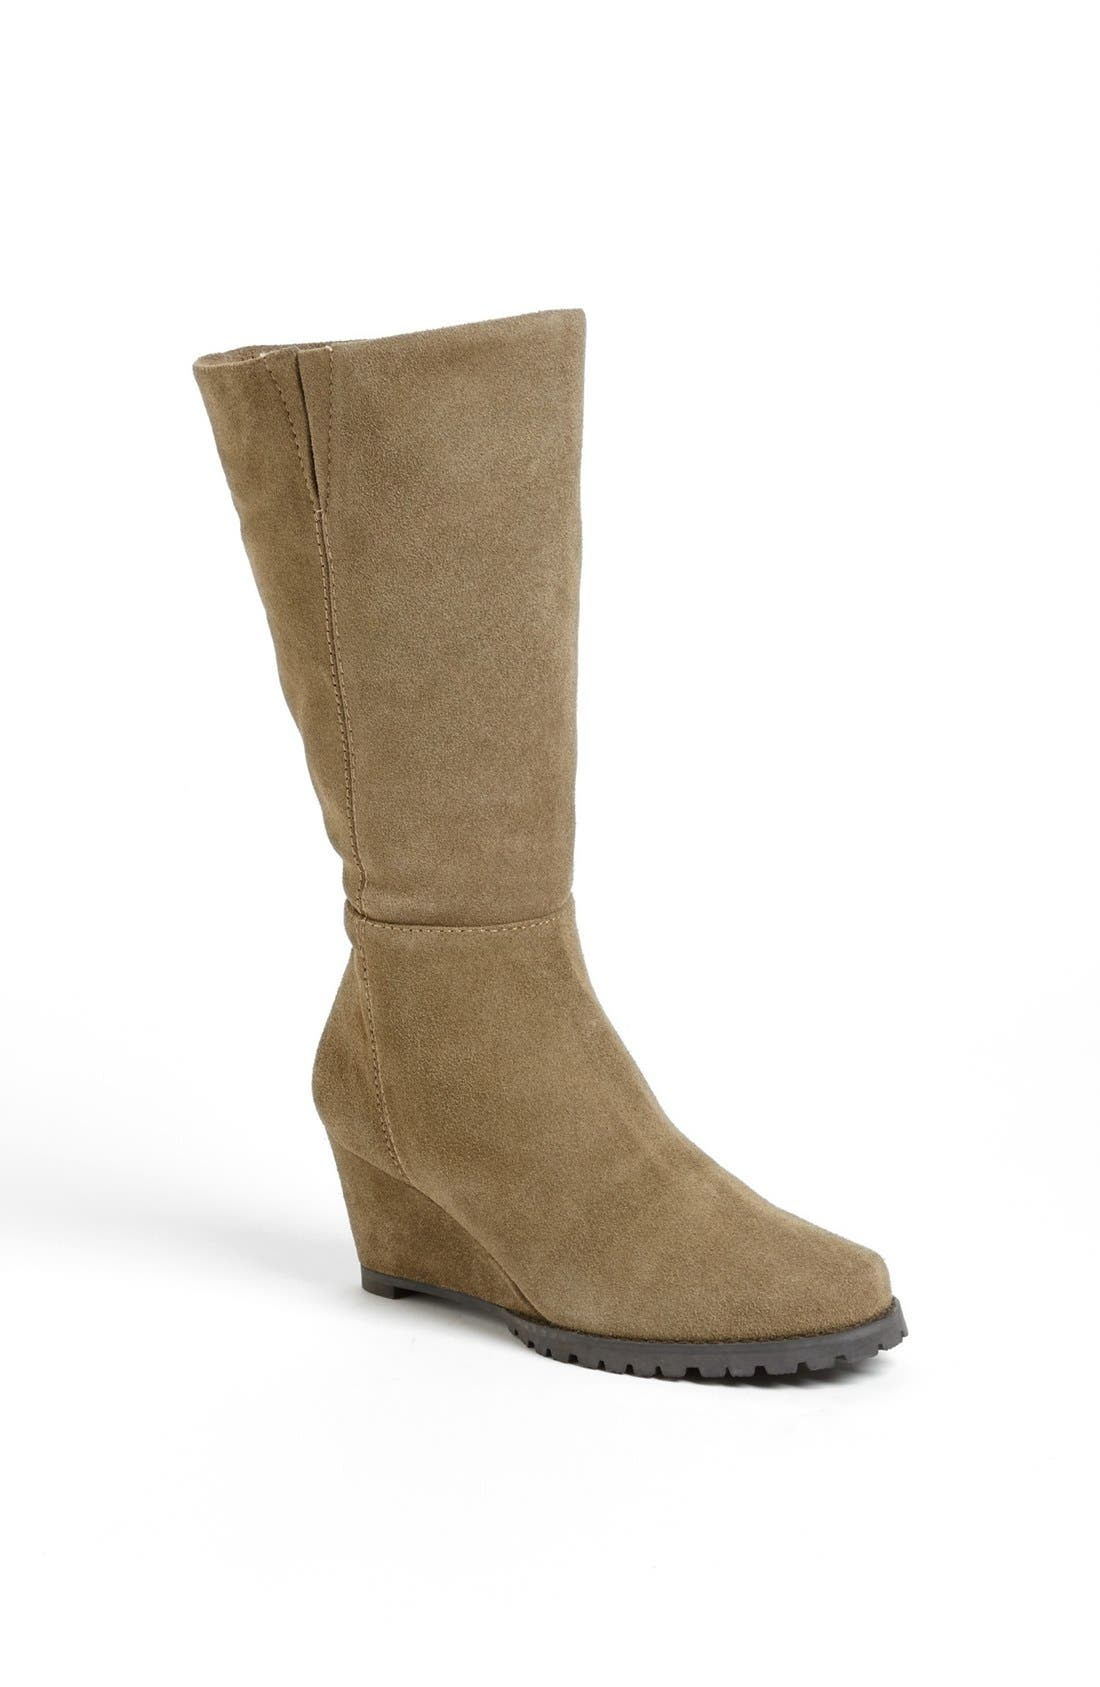 Alternate Image 1 Selected - SoftWalk® 'Dawson' Boot